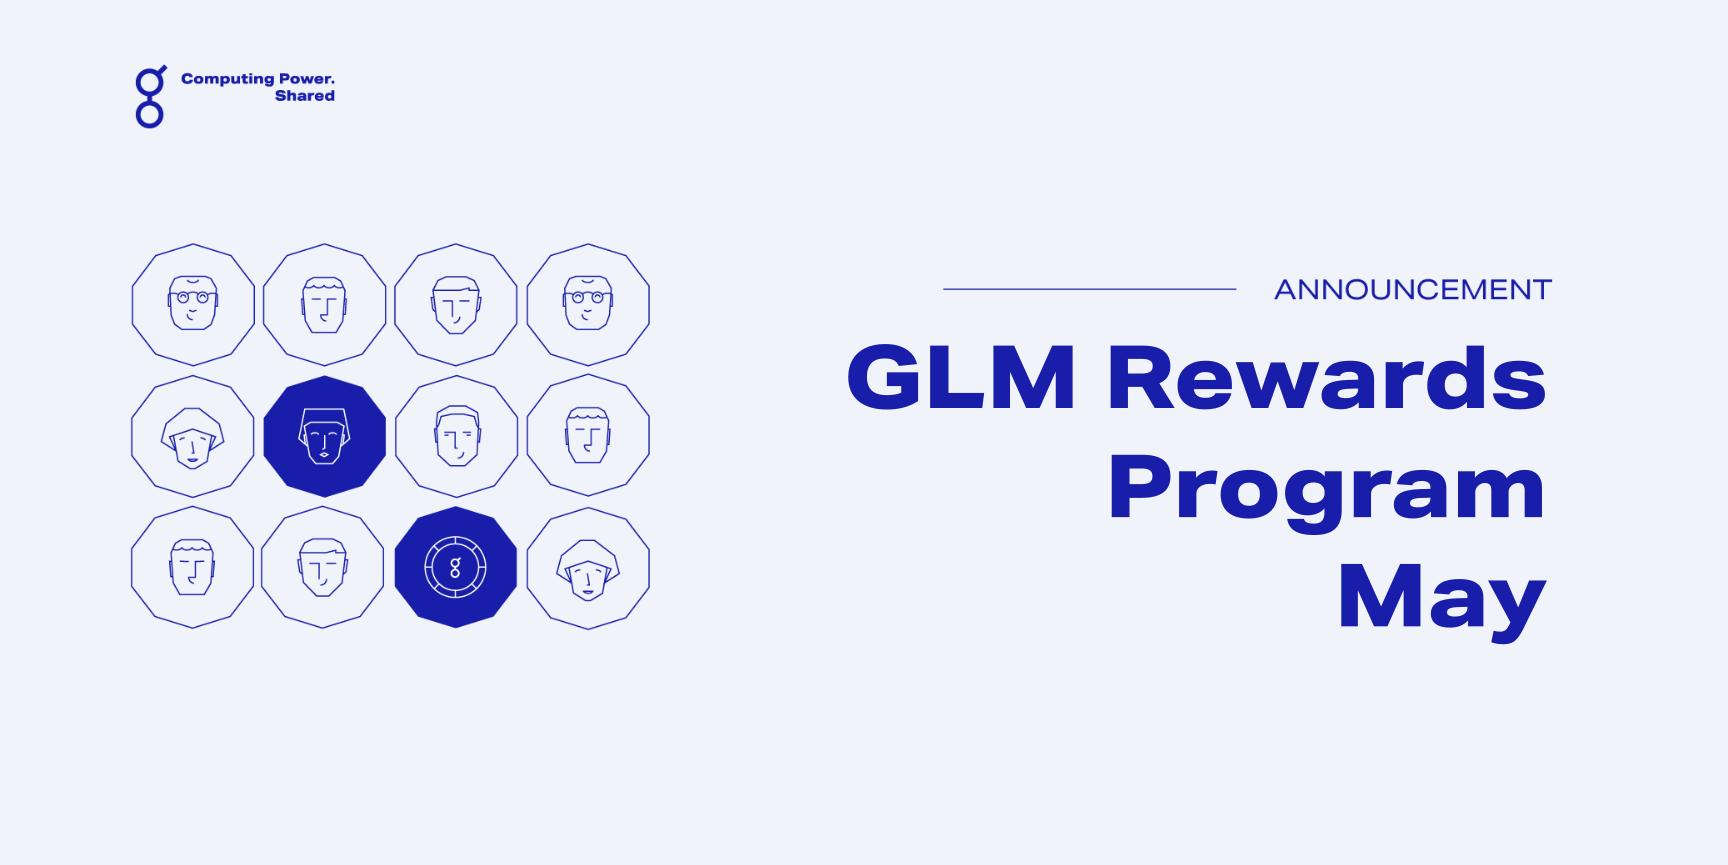 GLM Rewards Program May Update